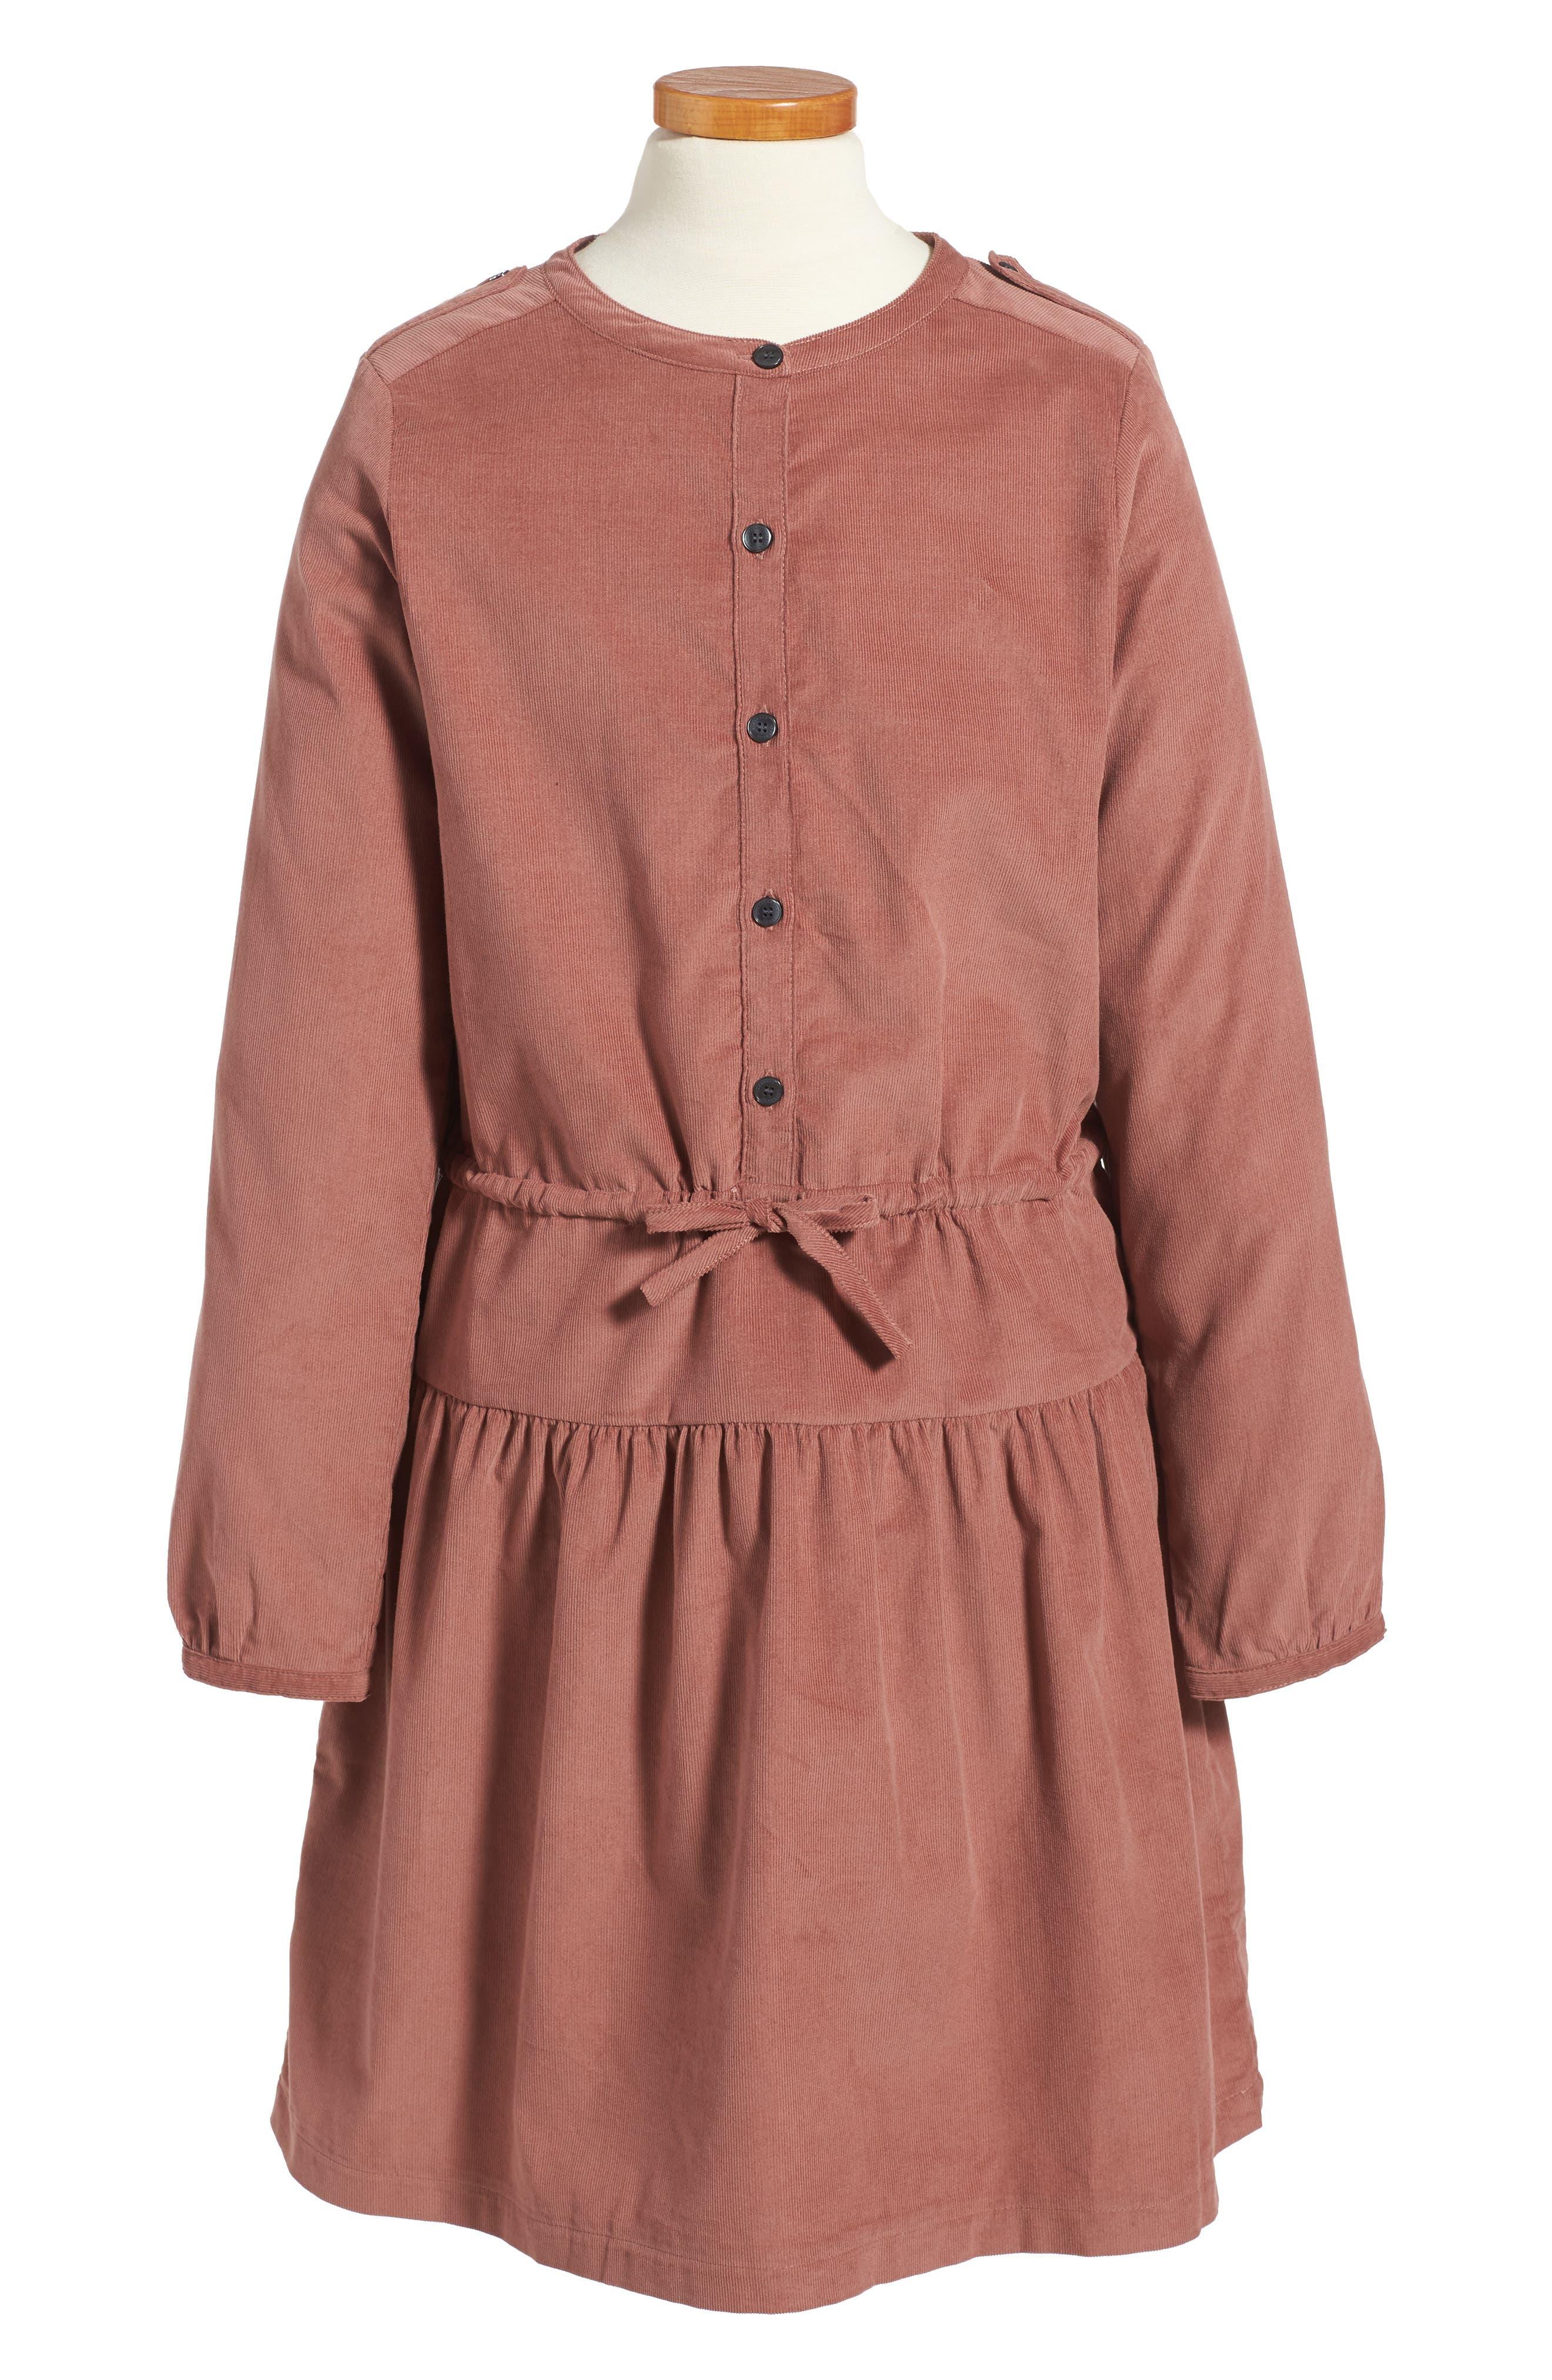 BURBERRY Celestine Corduroy Dress, Main, color, 930